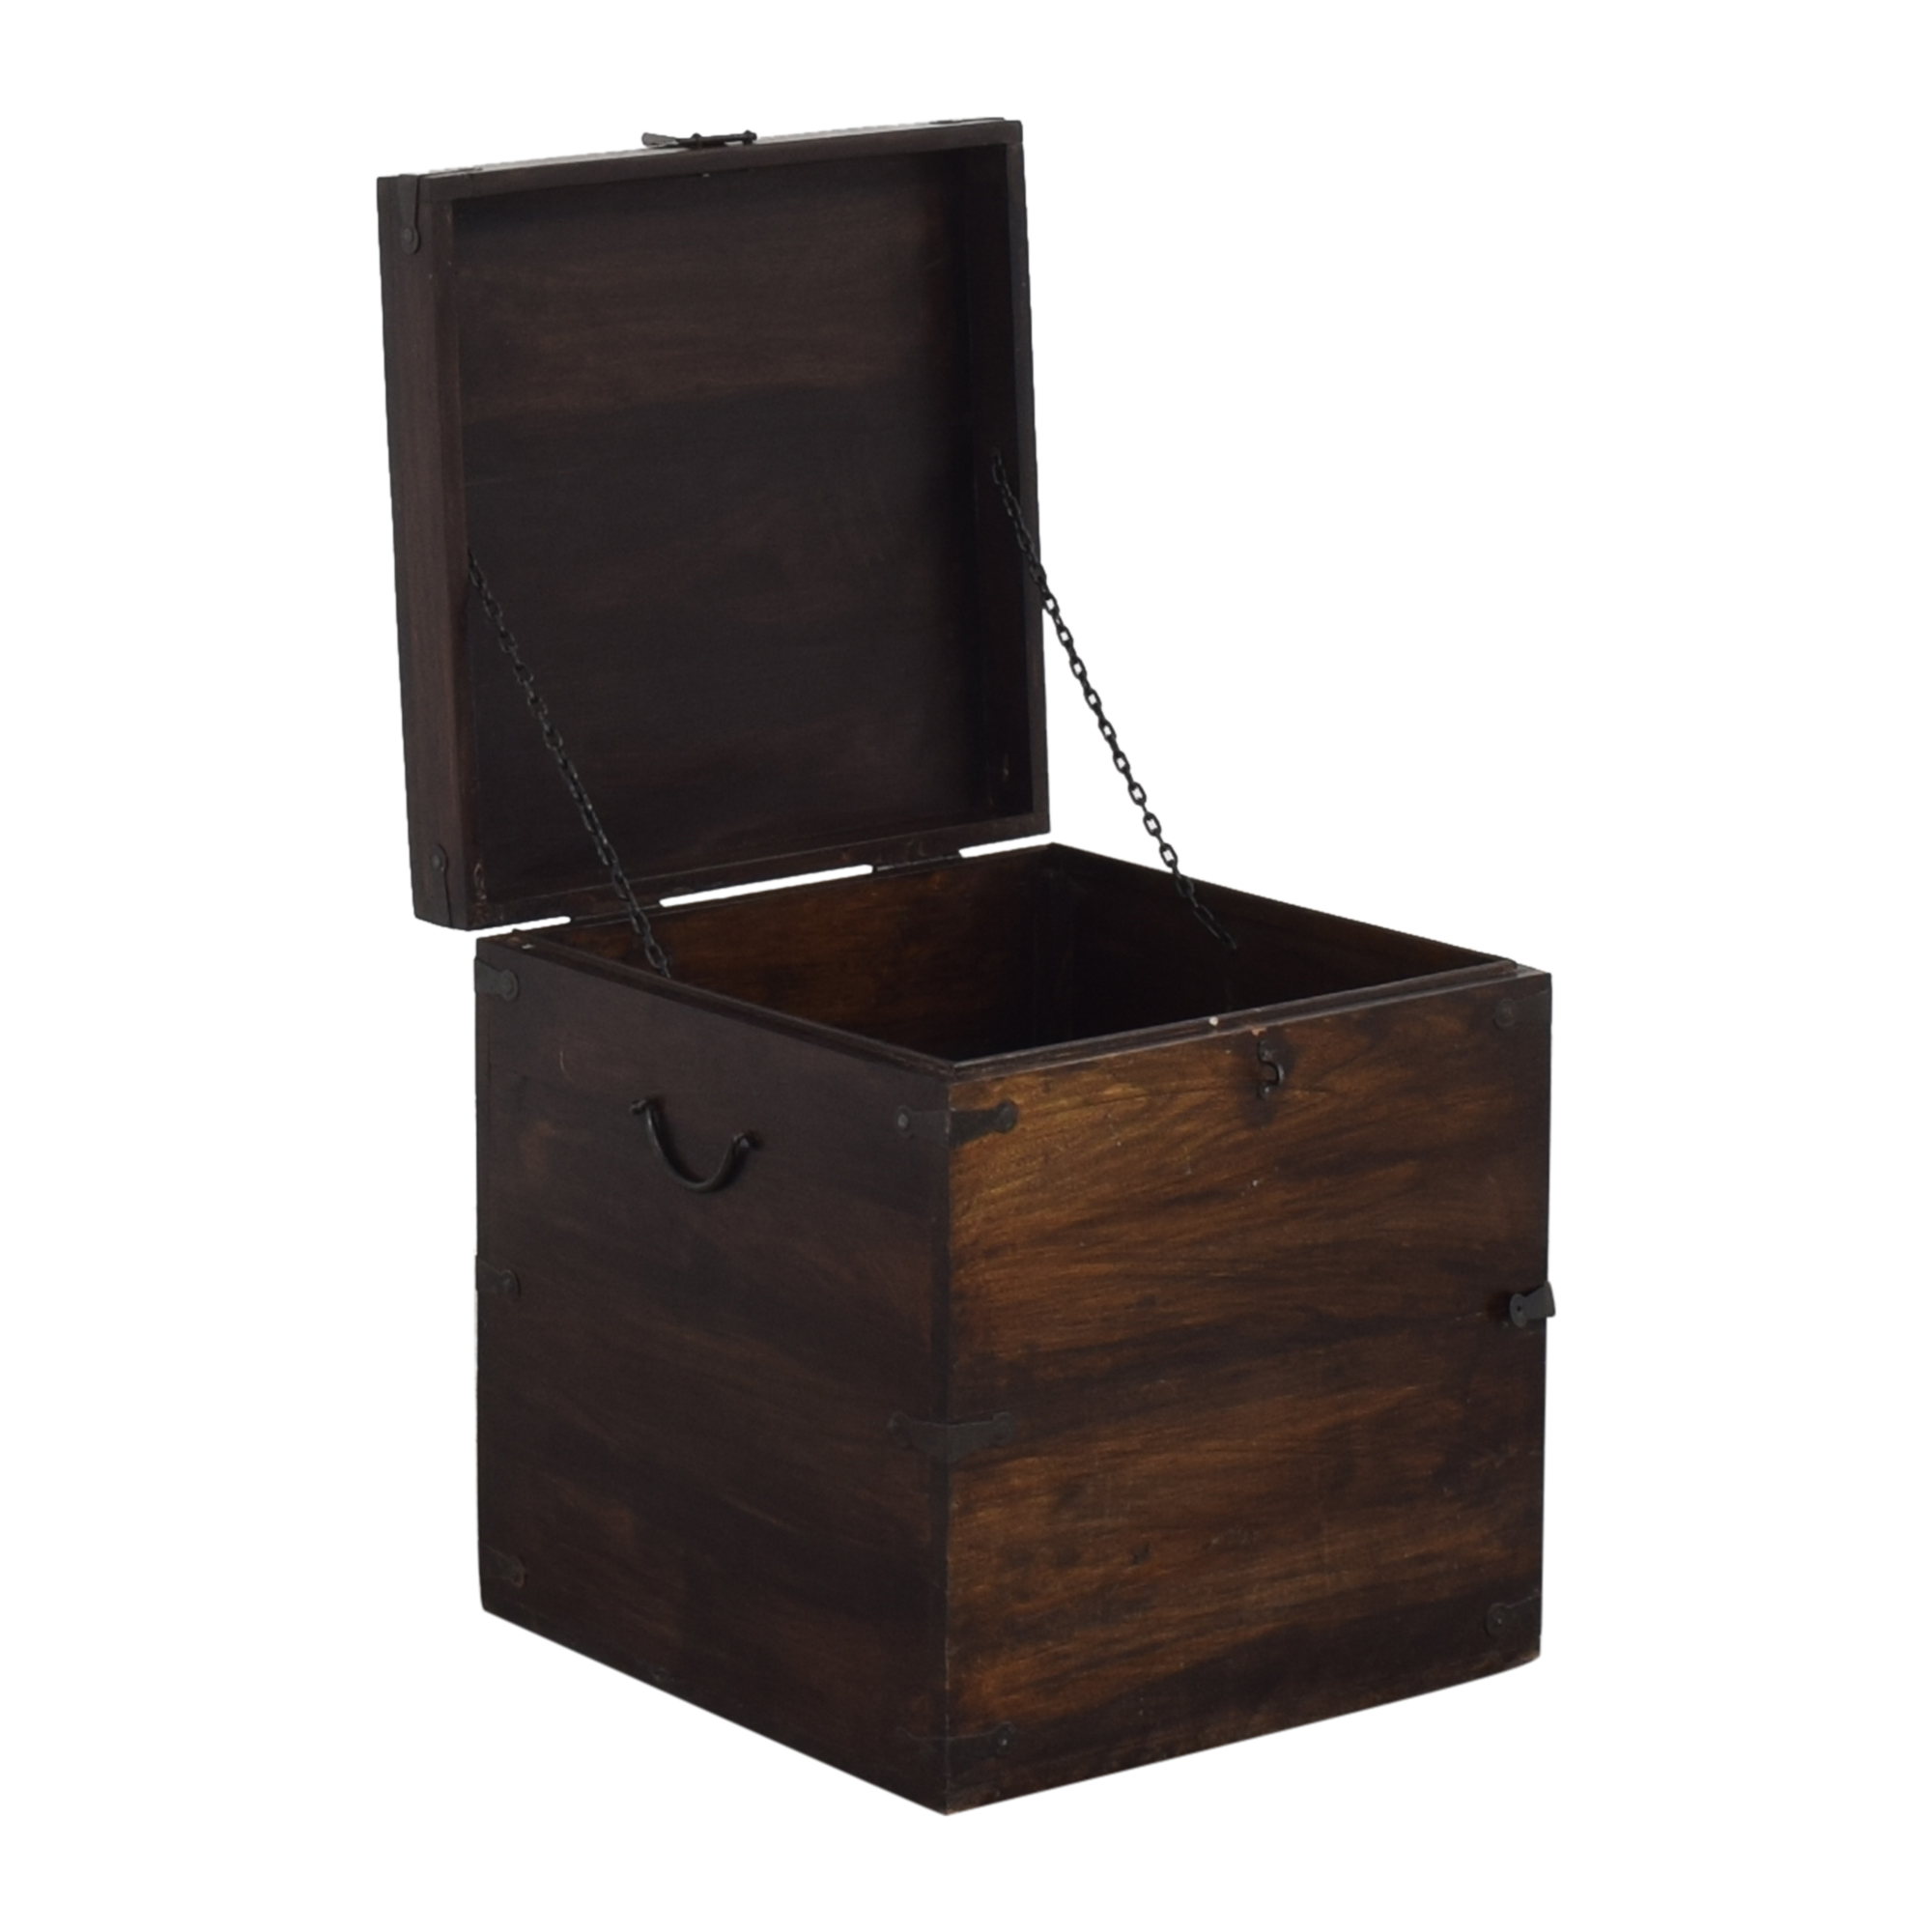 buy Pottery Barn Wooden Box Trunk Pottery Barn Trunks